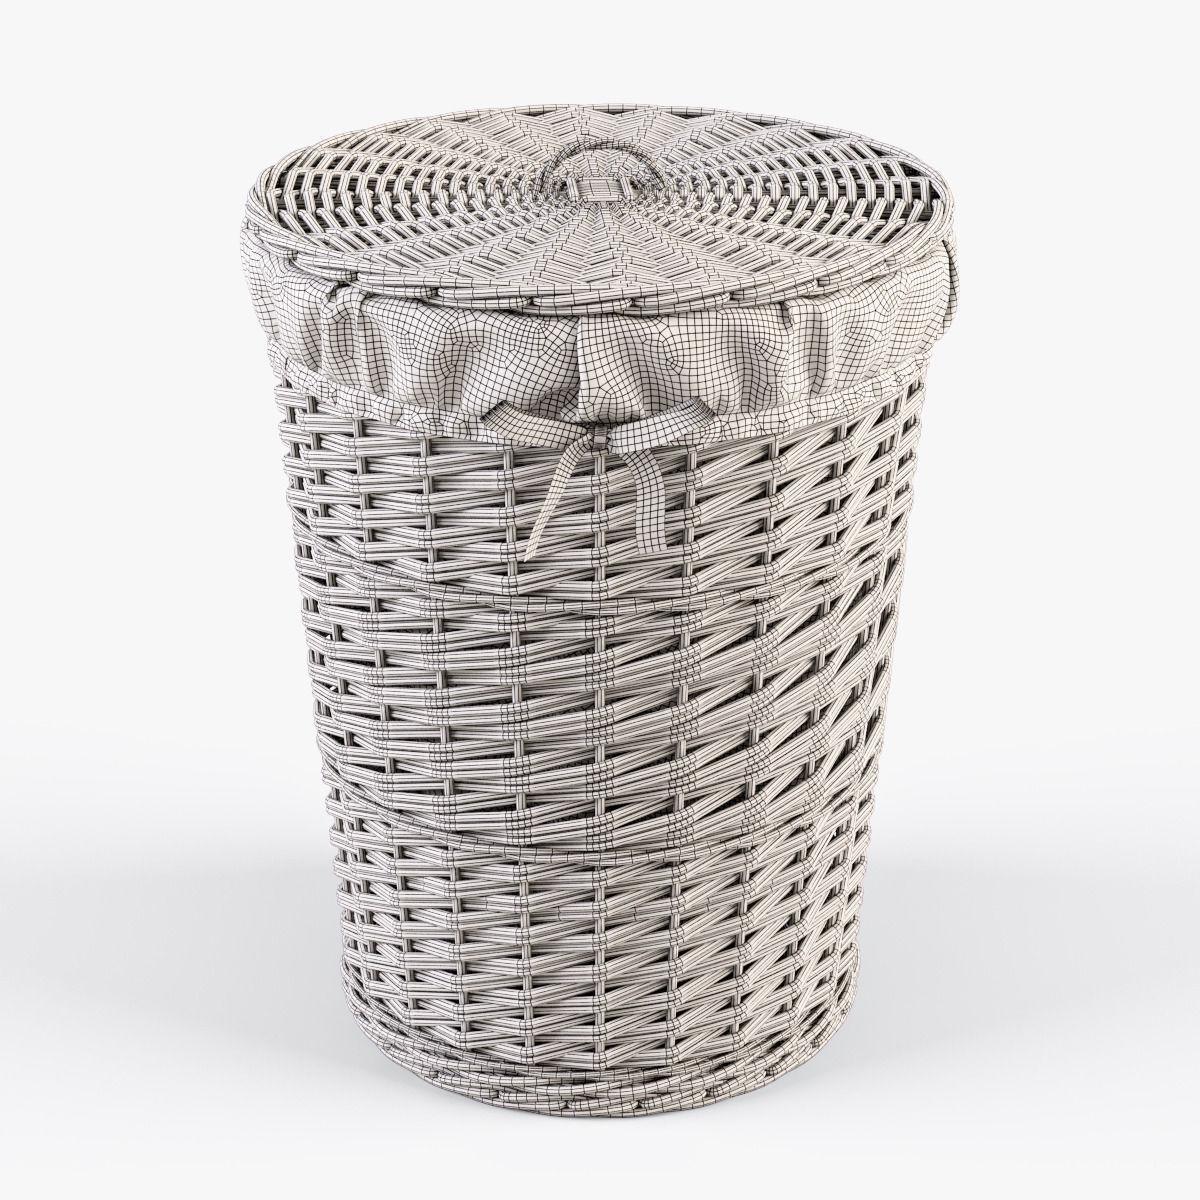 Wicker Laundry Basket 03 White Color Model Max Obj Mtl Fbx 7